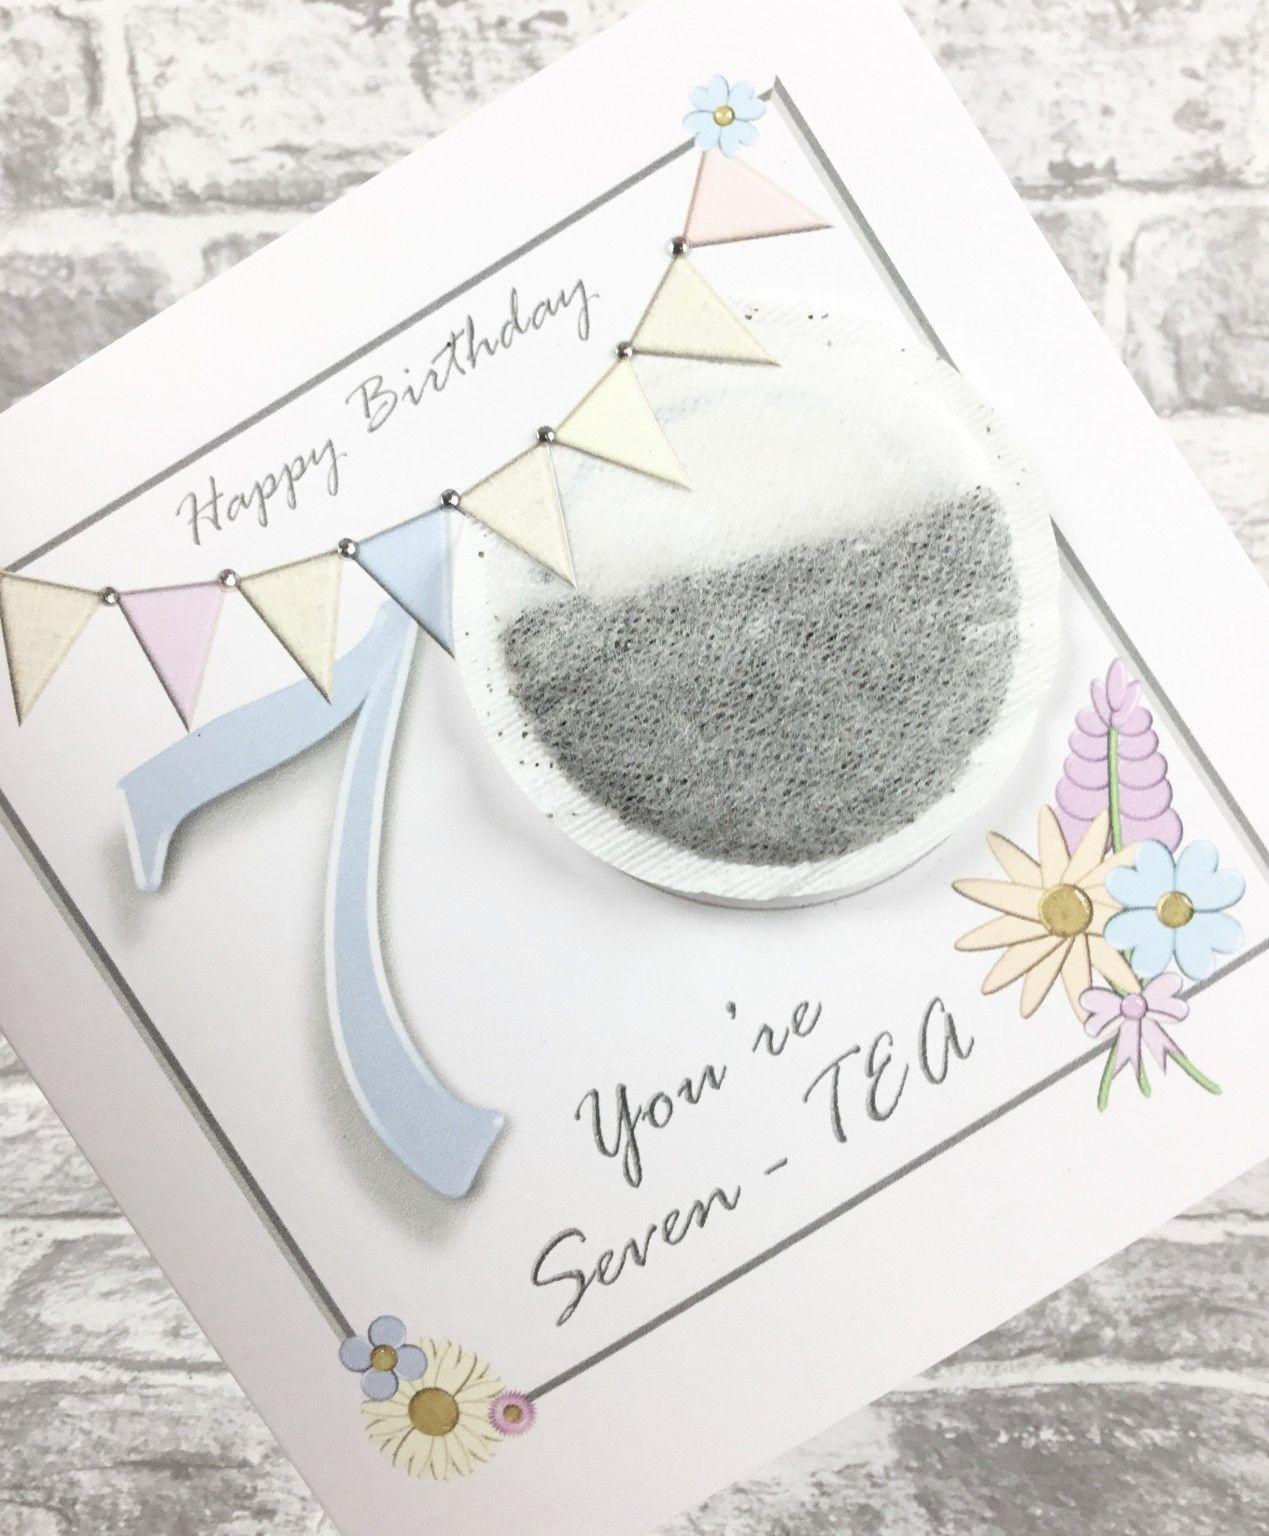 IMG1399 in 2020 70th birthday card, 40th birthday cards